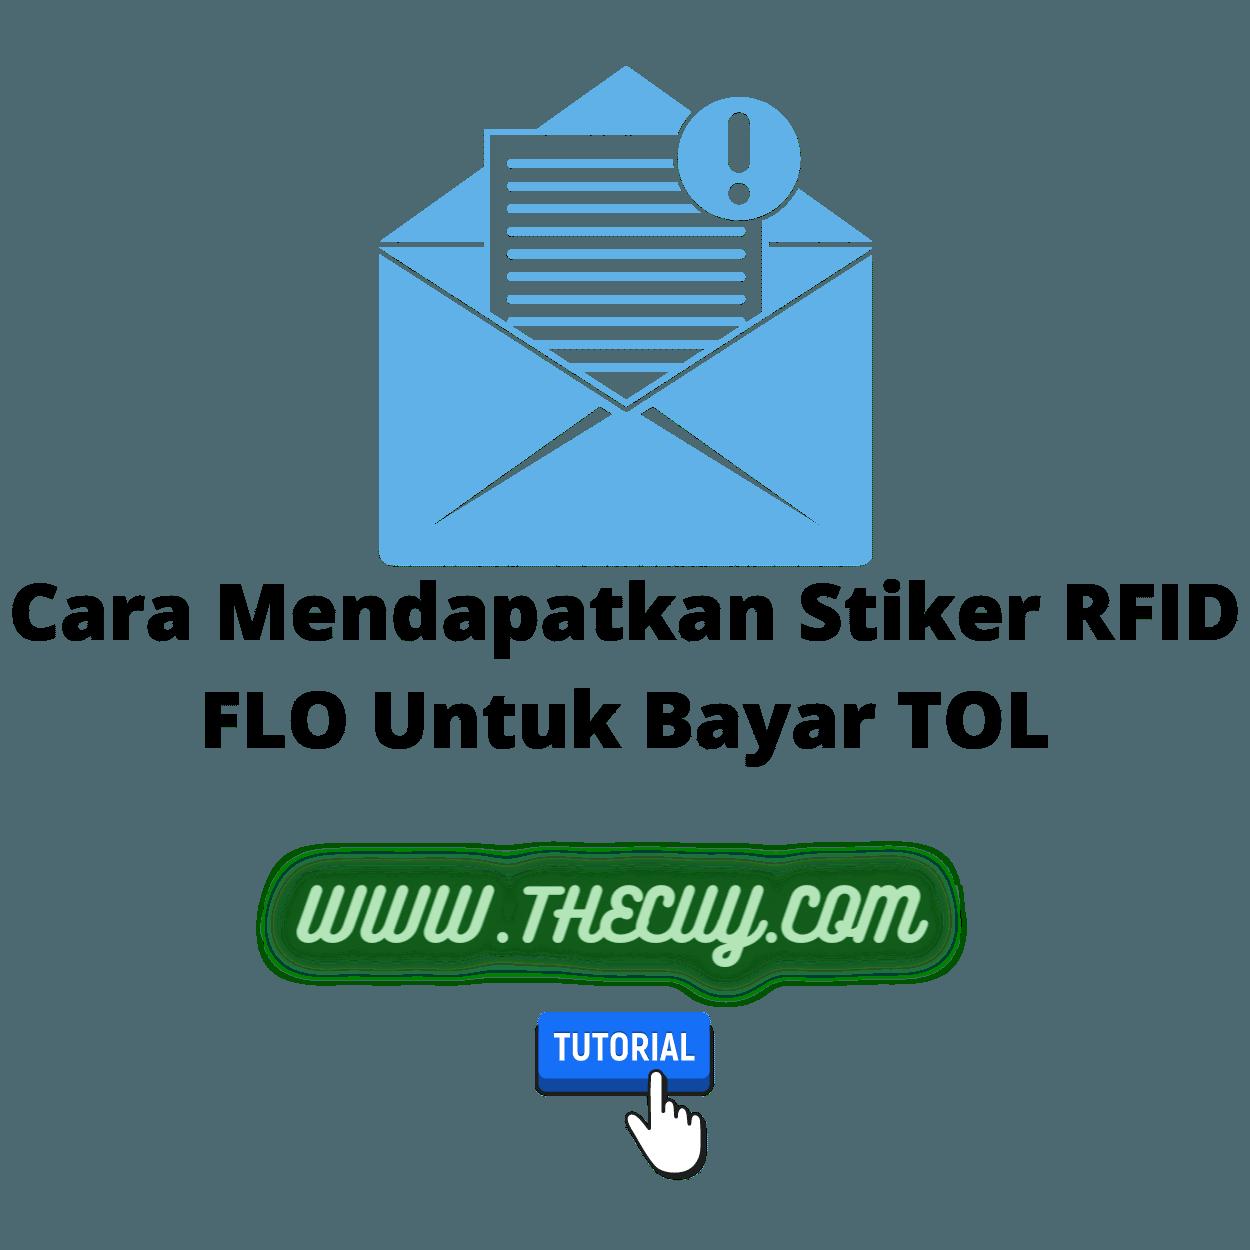 Cara Mendapatkan Stiker RFID FLO Untuk Bayar TOL